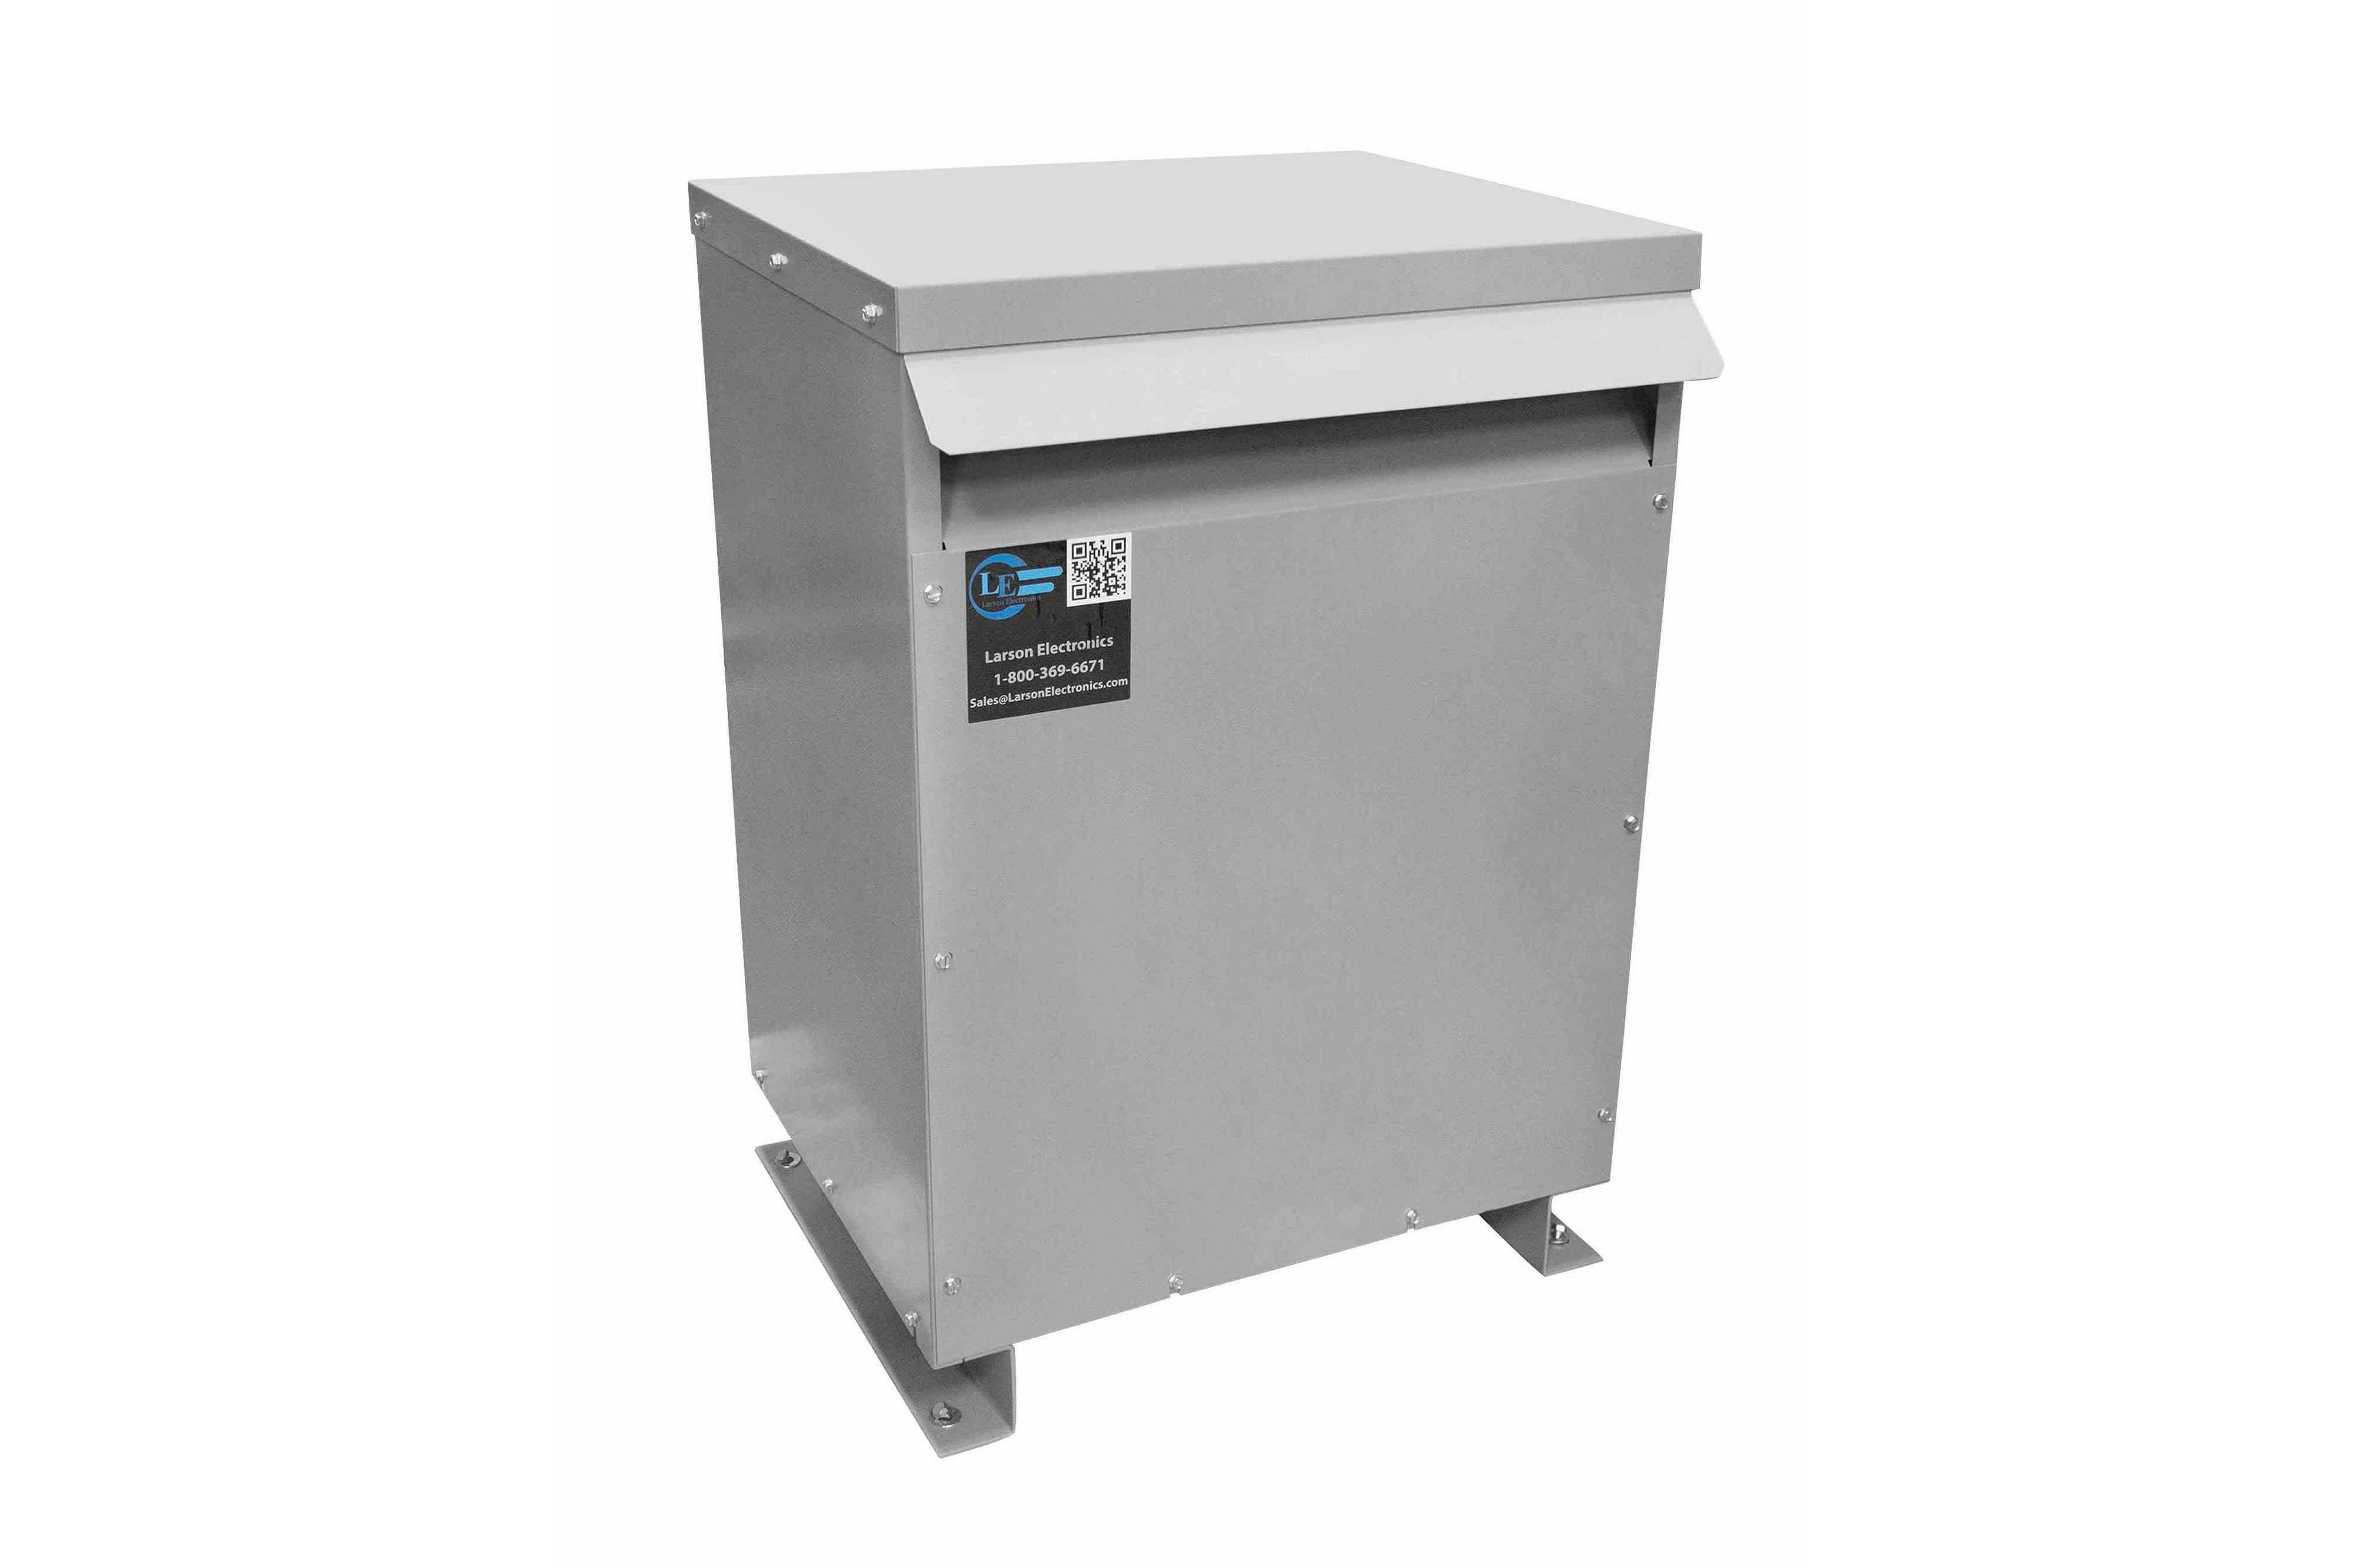 300 kVA 3PH Isolation Transformer, 460V Wye Primary, 208V Delta Secondary, N3R, Ventilated, 60 Hz